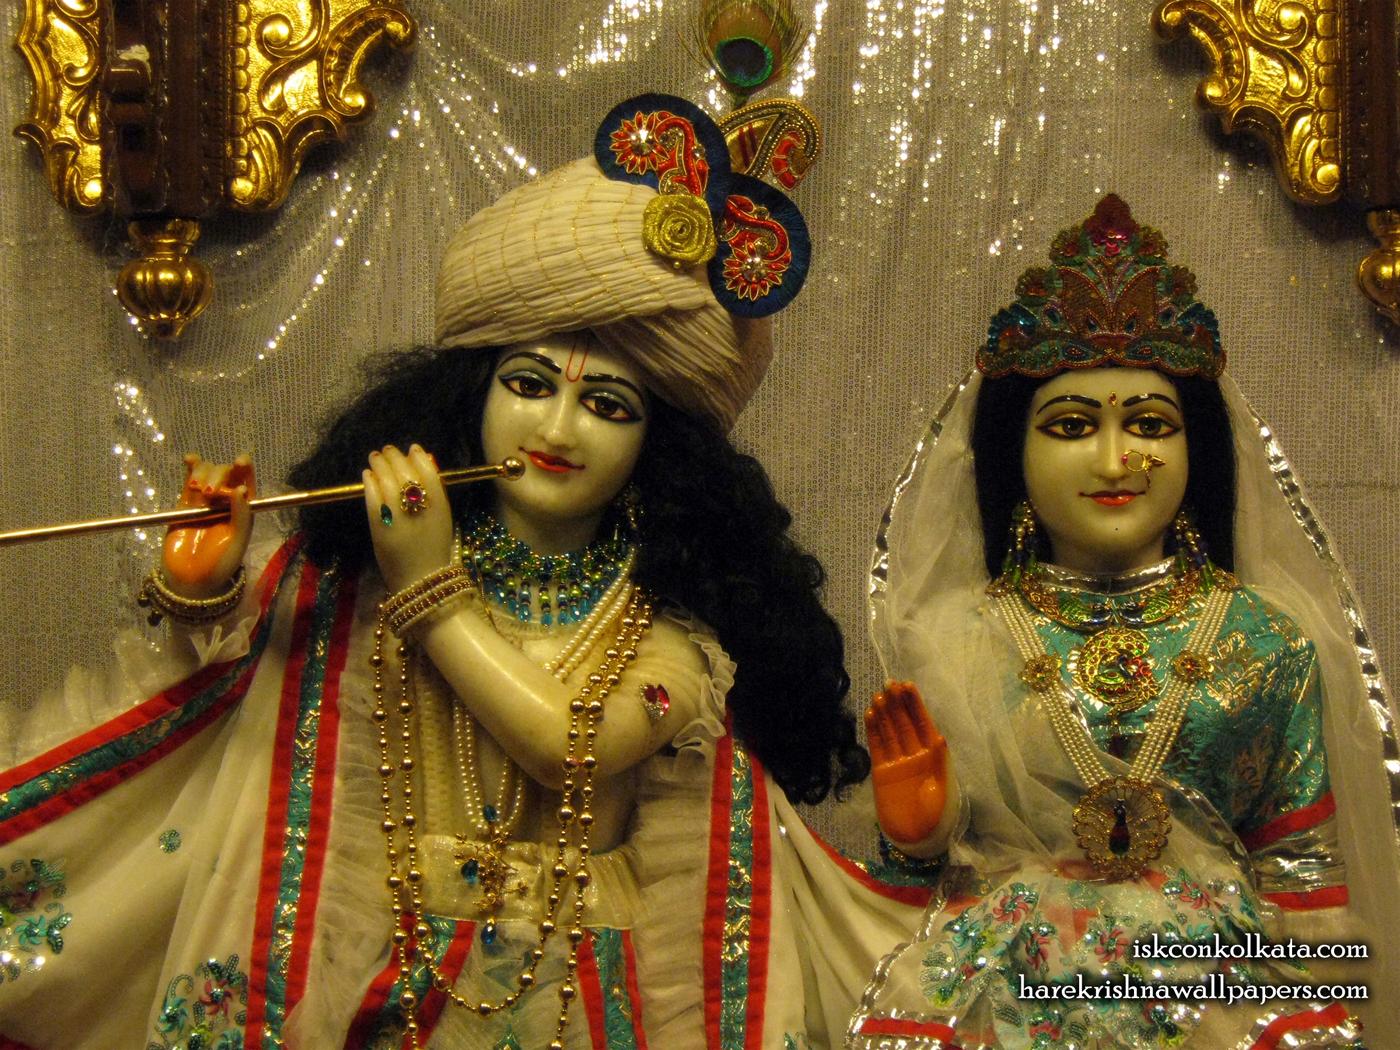 Sri Sri Radha Govinda Close up Wallpaper (003) Size 1400x1050 Download